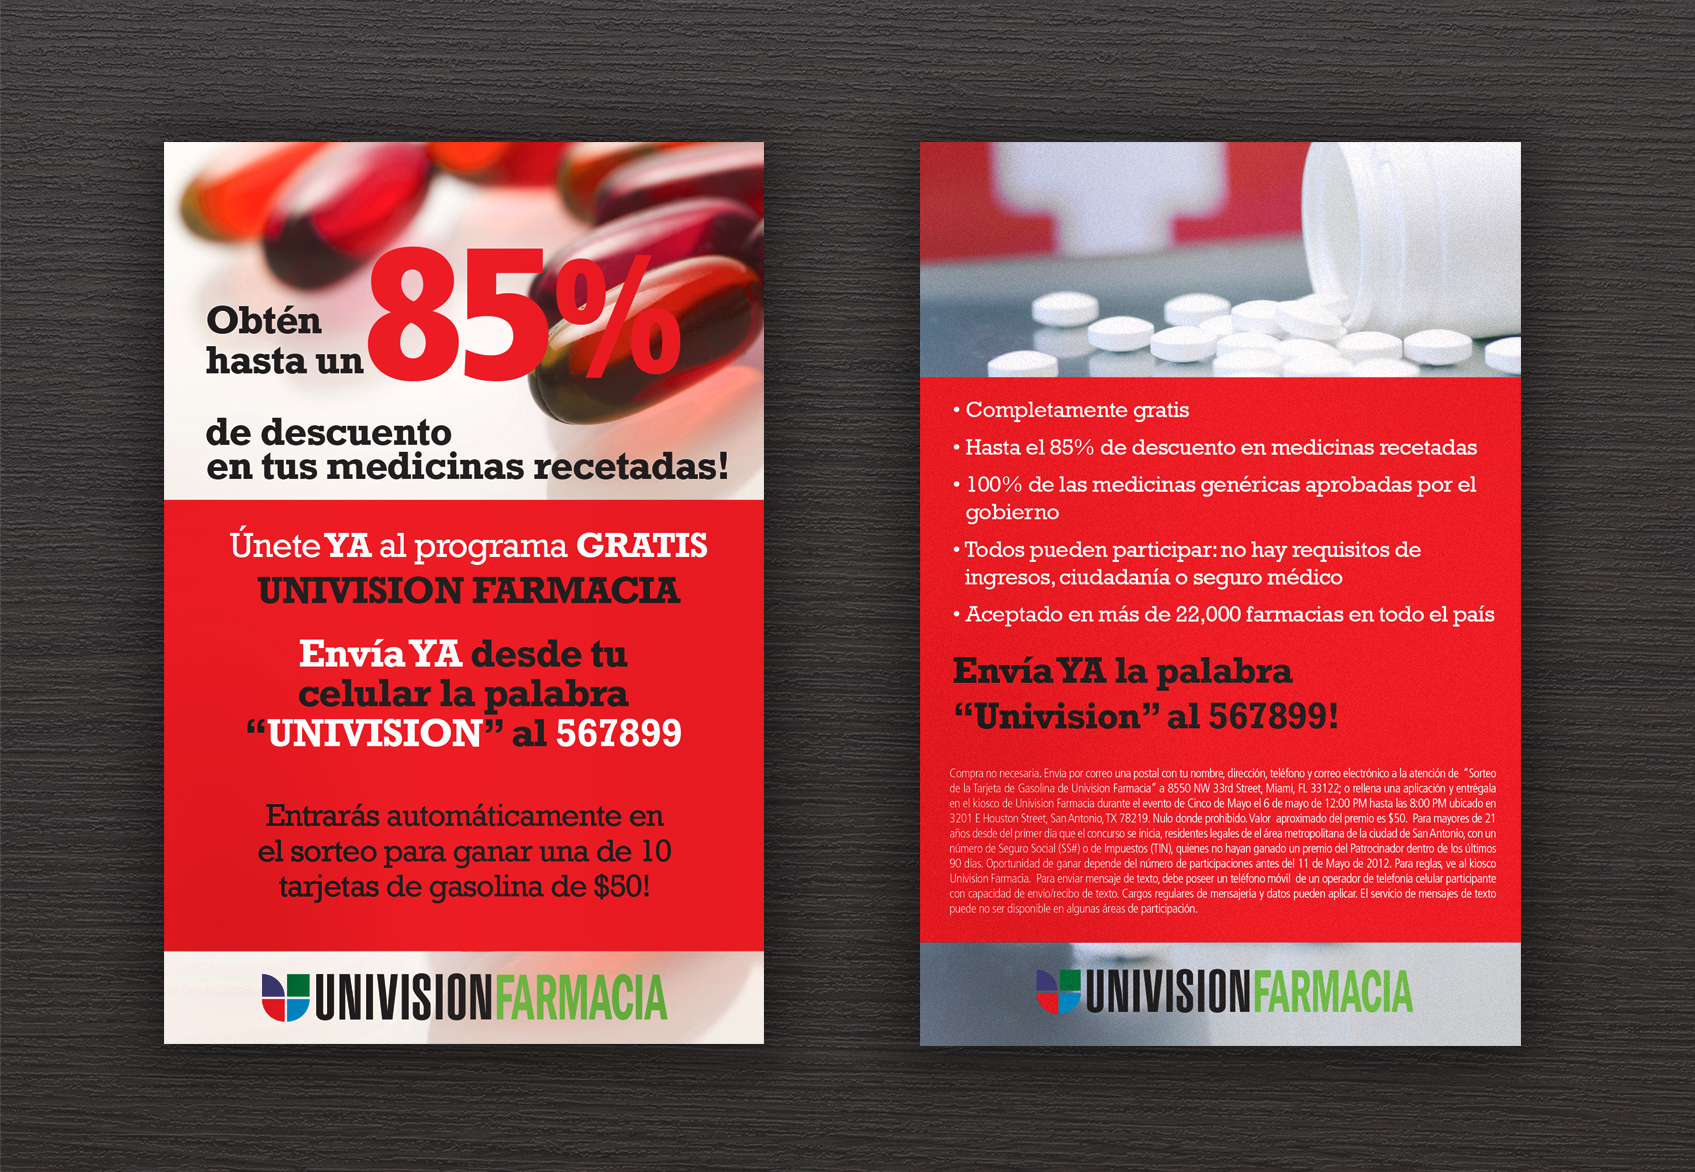 Univision6.jpg